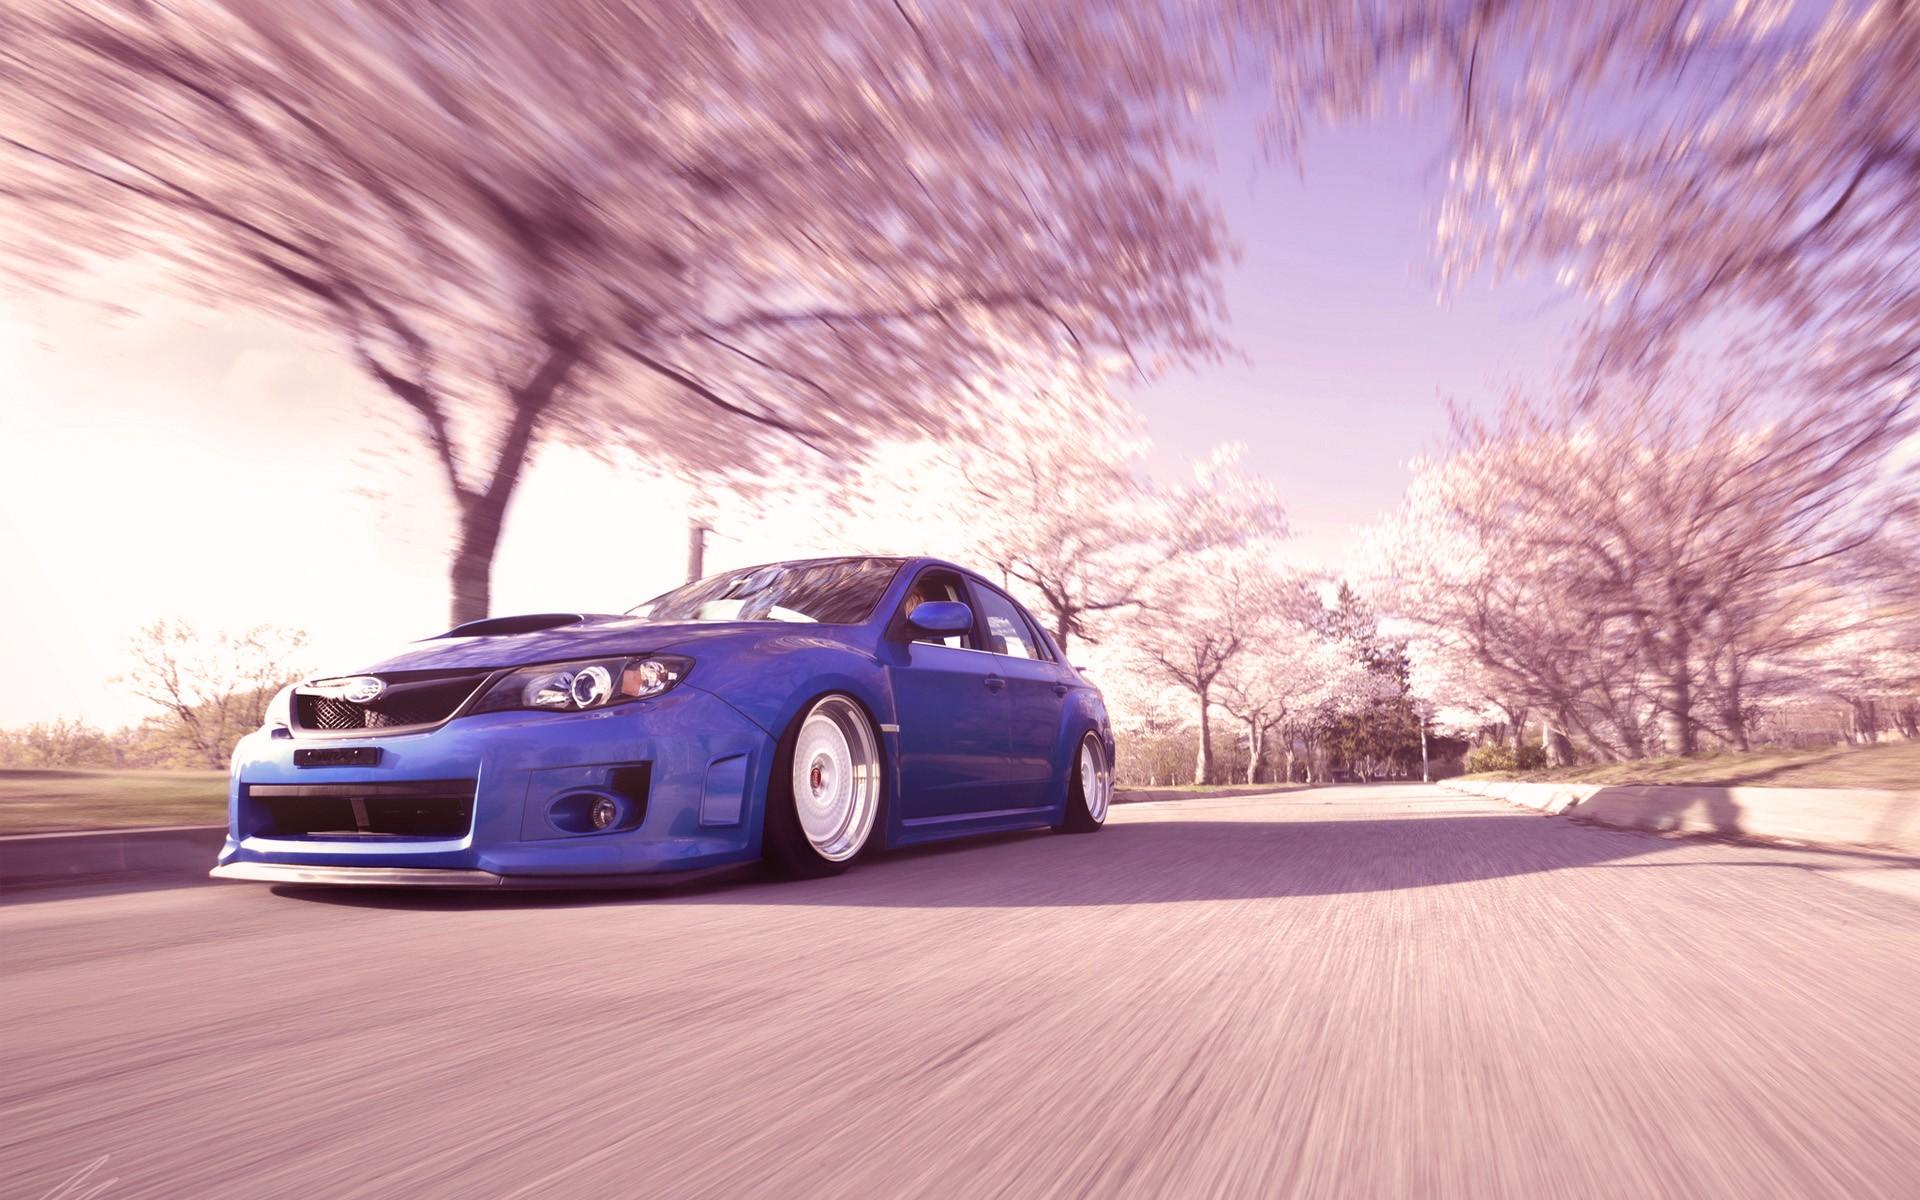 JDM Cars |Pink Subaru Impreza Wrx